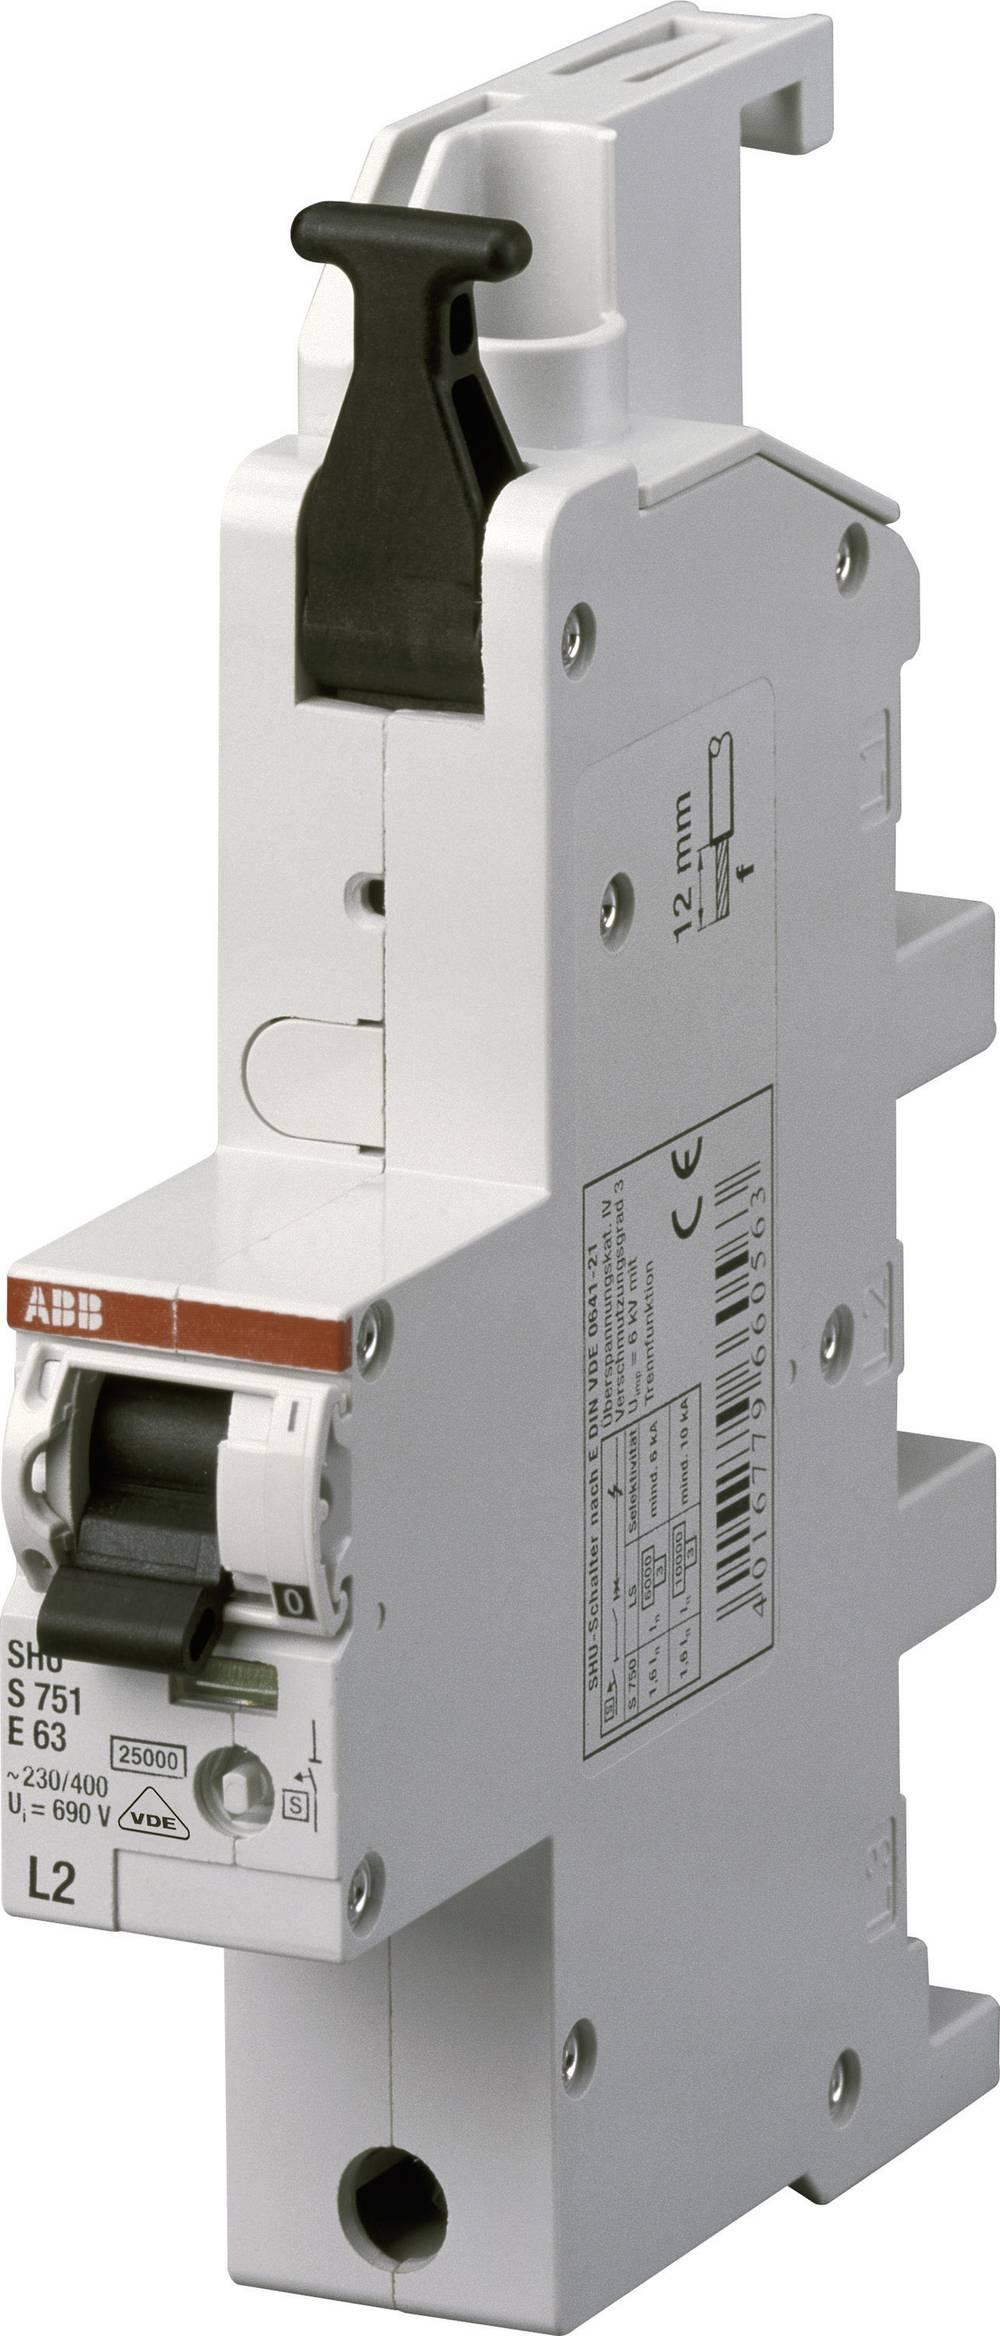 Instalacijski prekidač 1-polni 25 A ABB 2CDS781001R7252